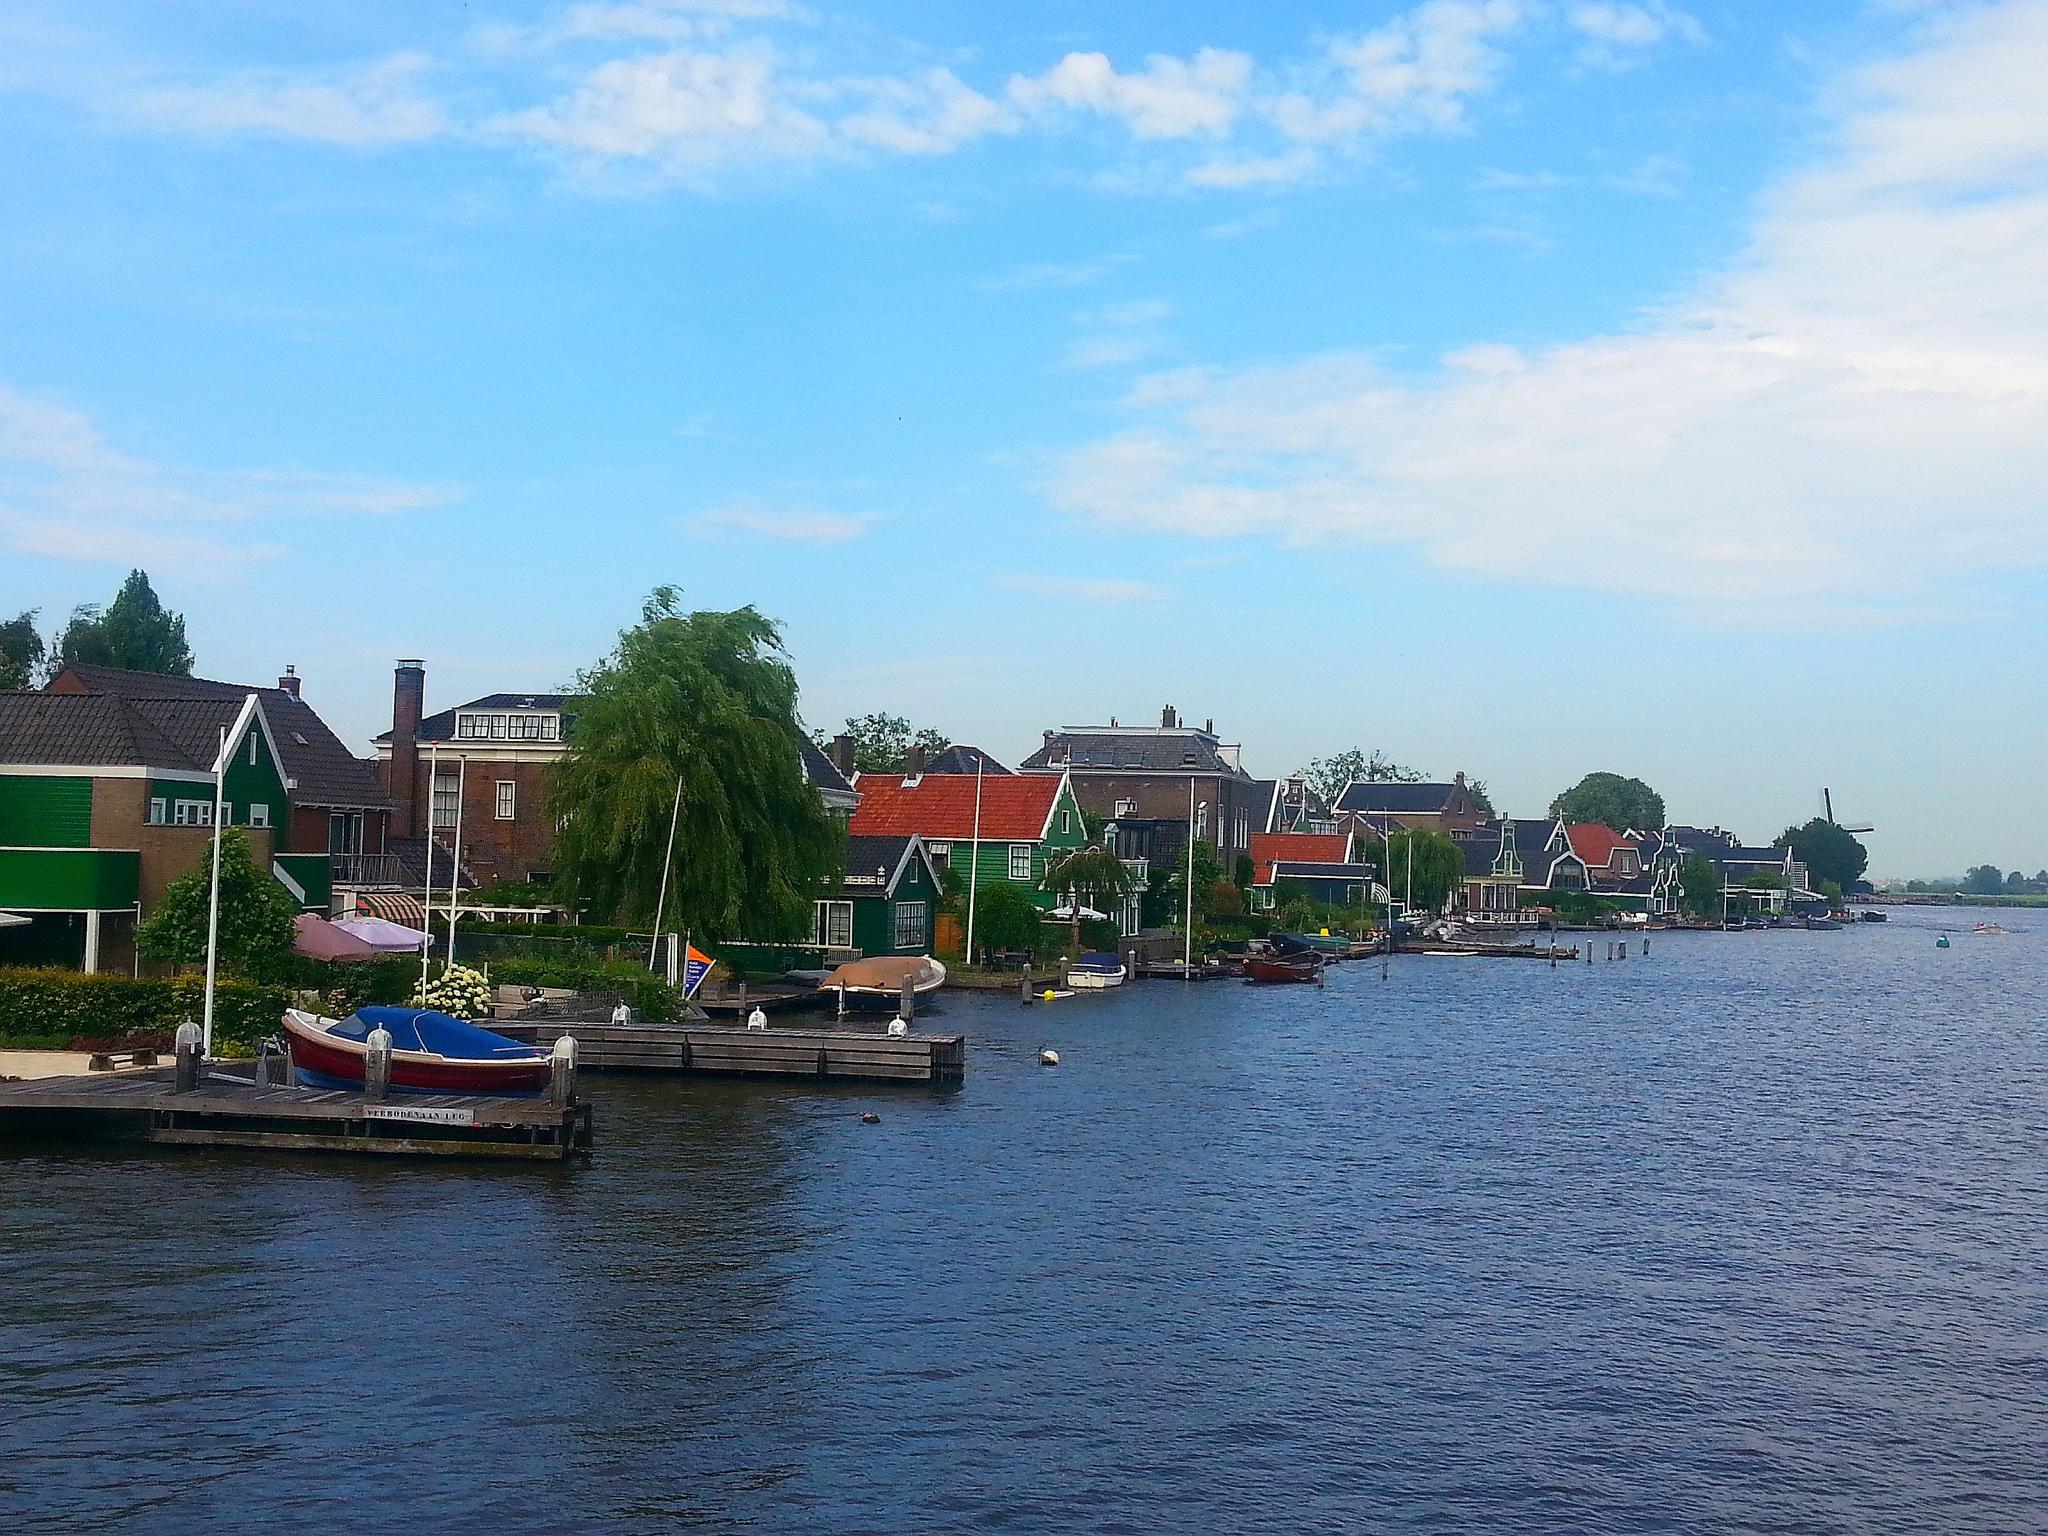 miasteczka w Holandii Zaanse Schans